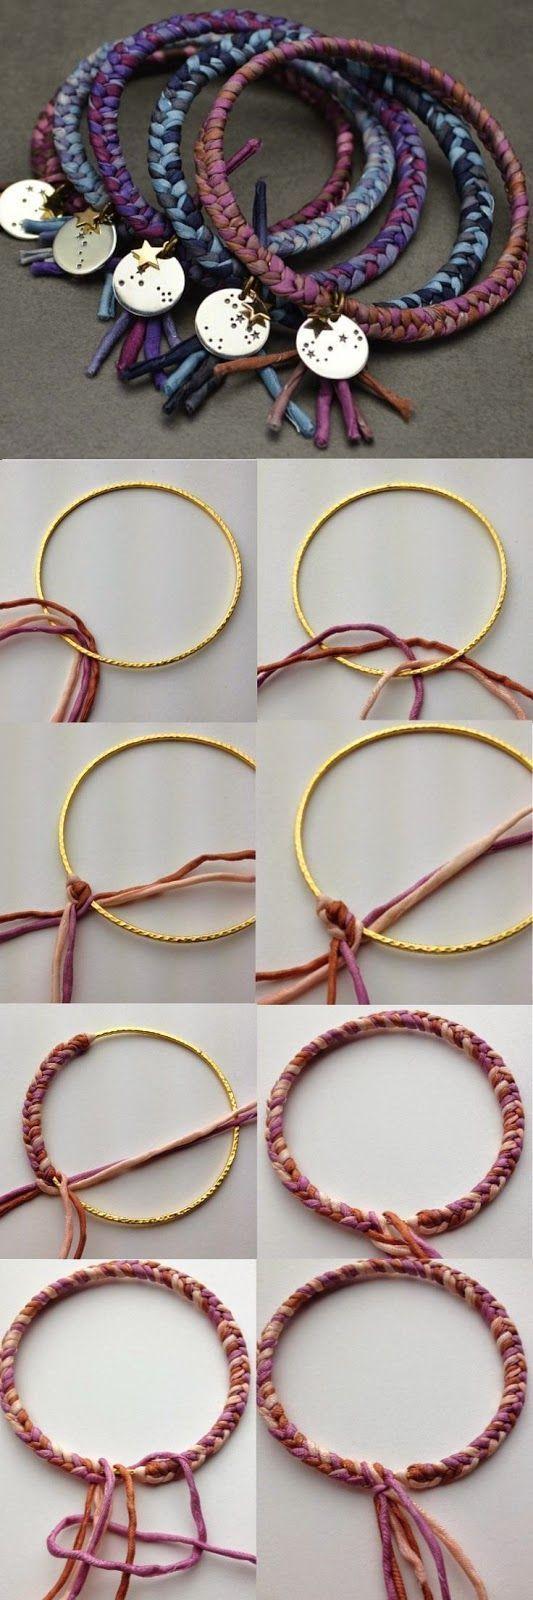 star charm, star charms, constellation charm, zodiac charms, silver charms, silk cord, silk bracelet, stacking bracelets, bracelet design